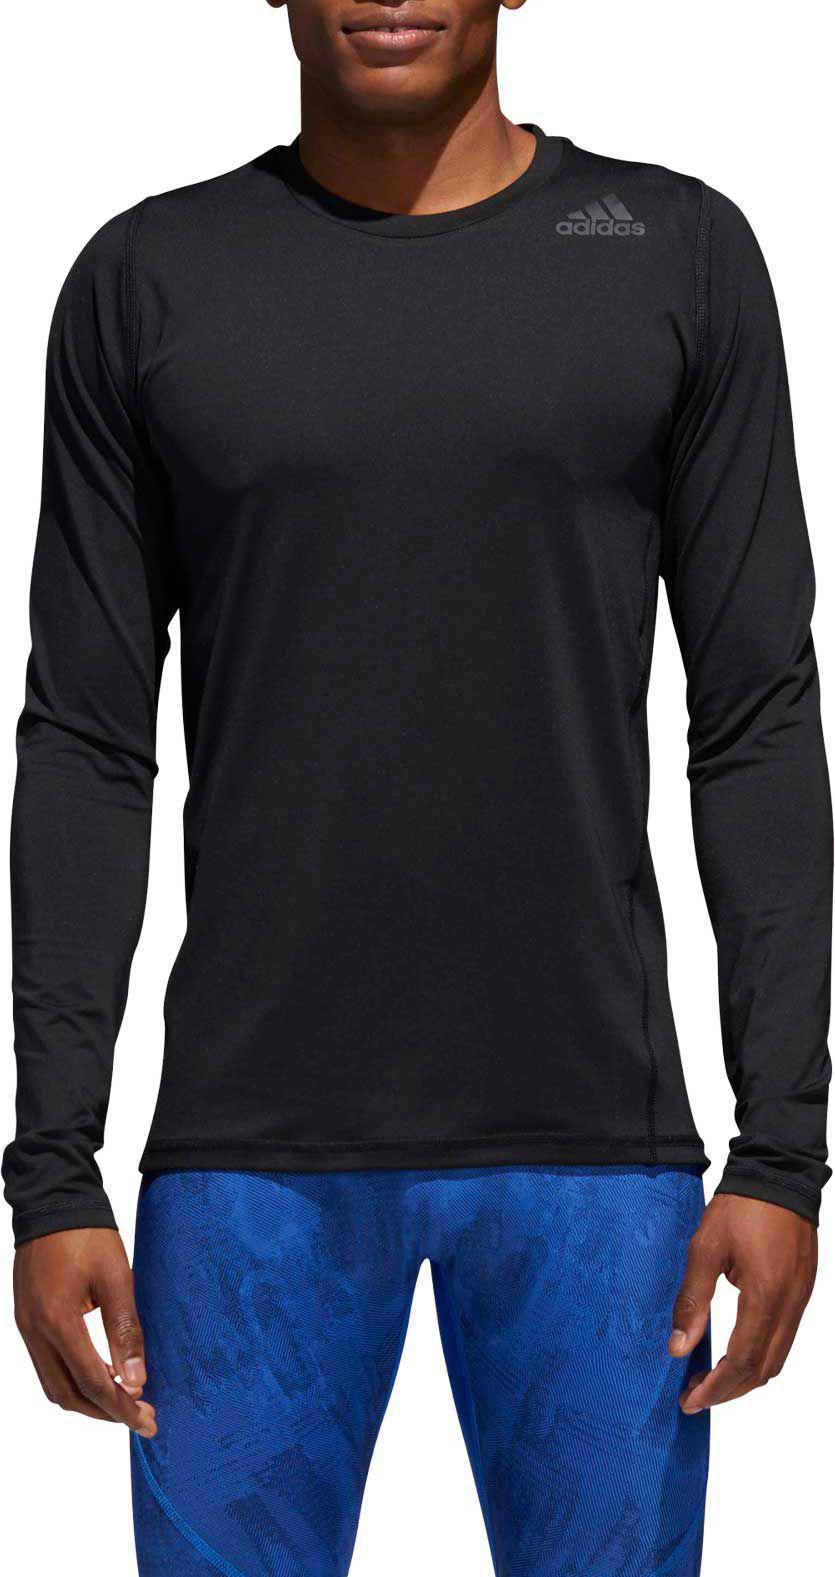 3e3af04fb08 Adidas - Black Alphaskin Sport Fitted Long Sleeve Training T-shirt for Men  - Lyst. View fullscreen